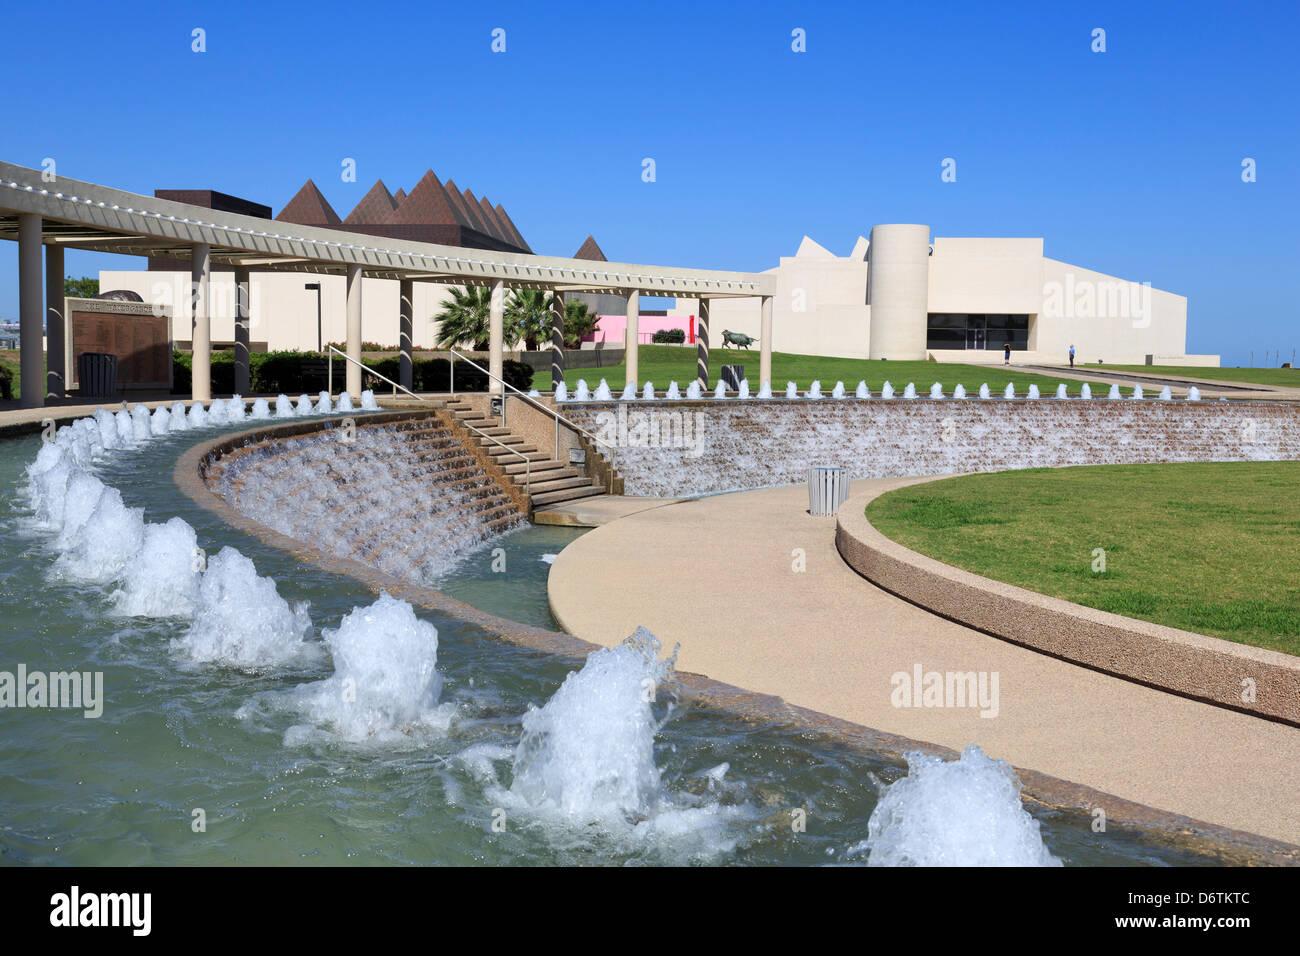 Corpus Christi Water Gardens Garden Ftempo